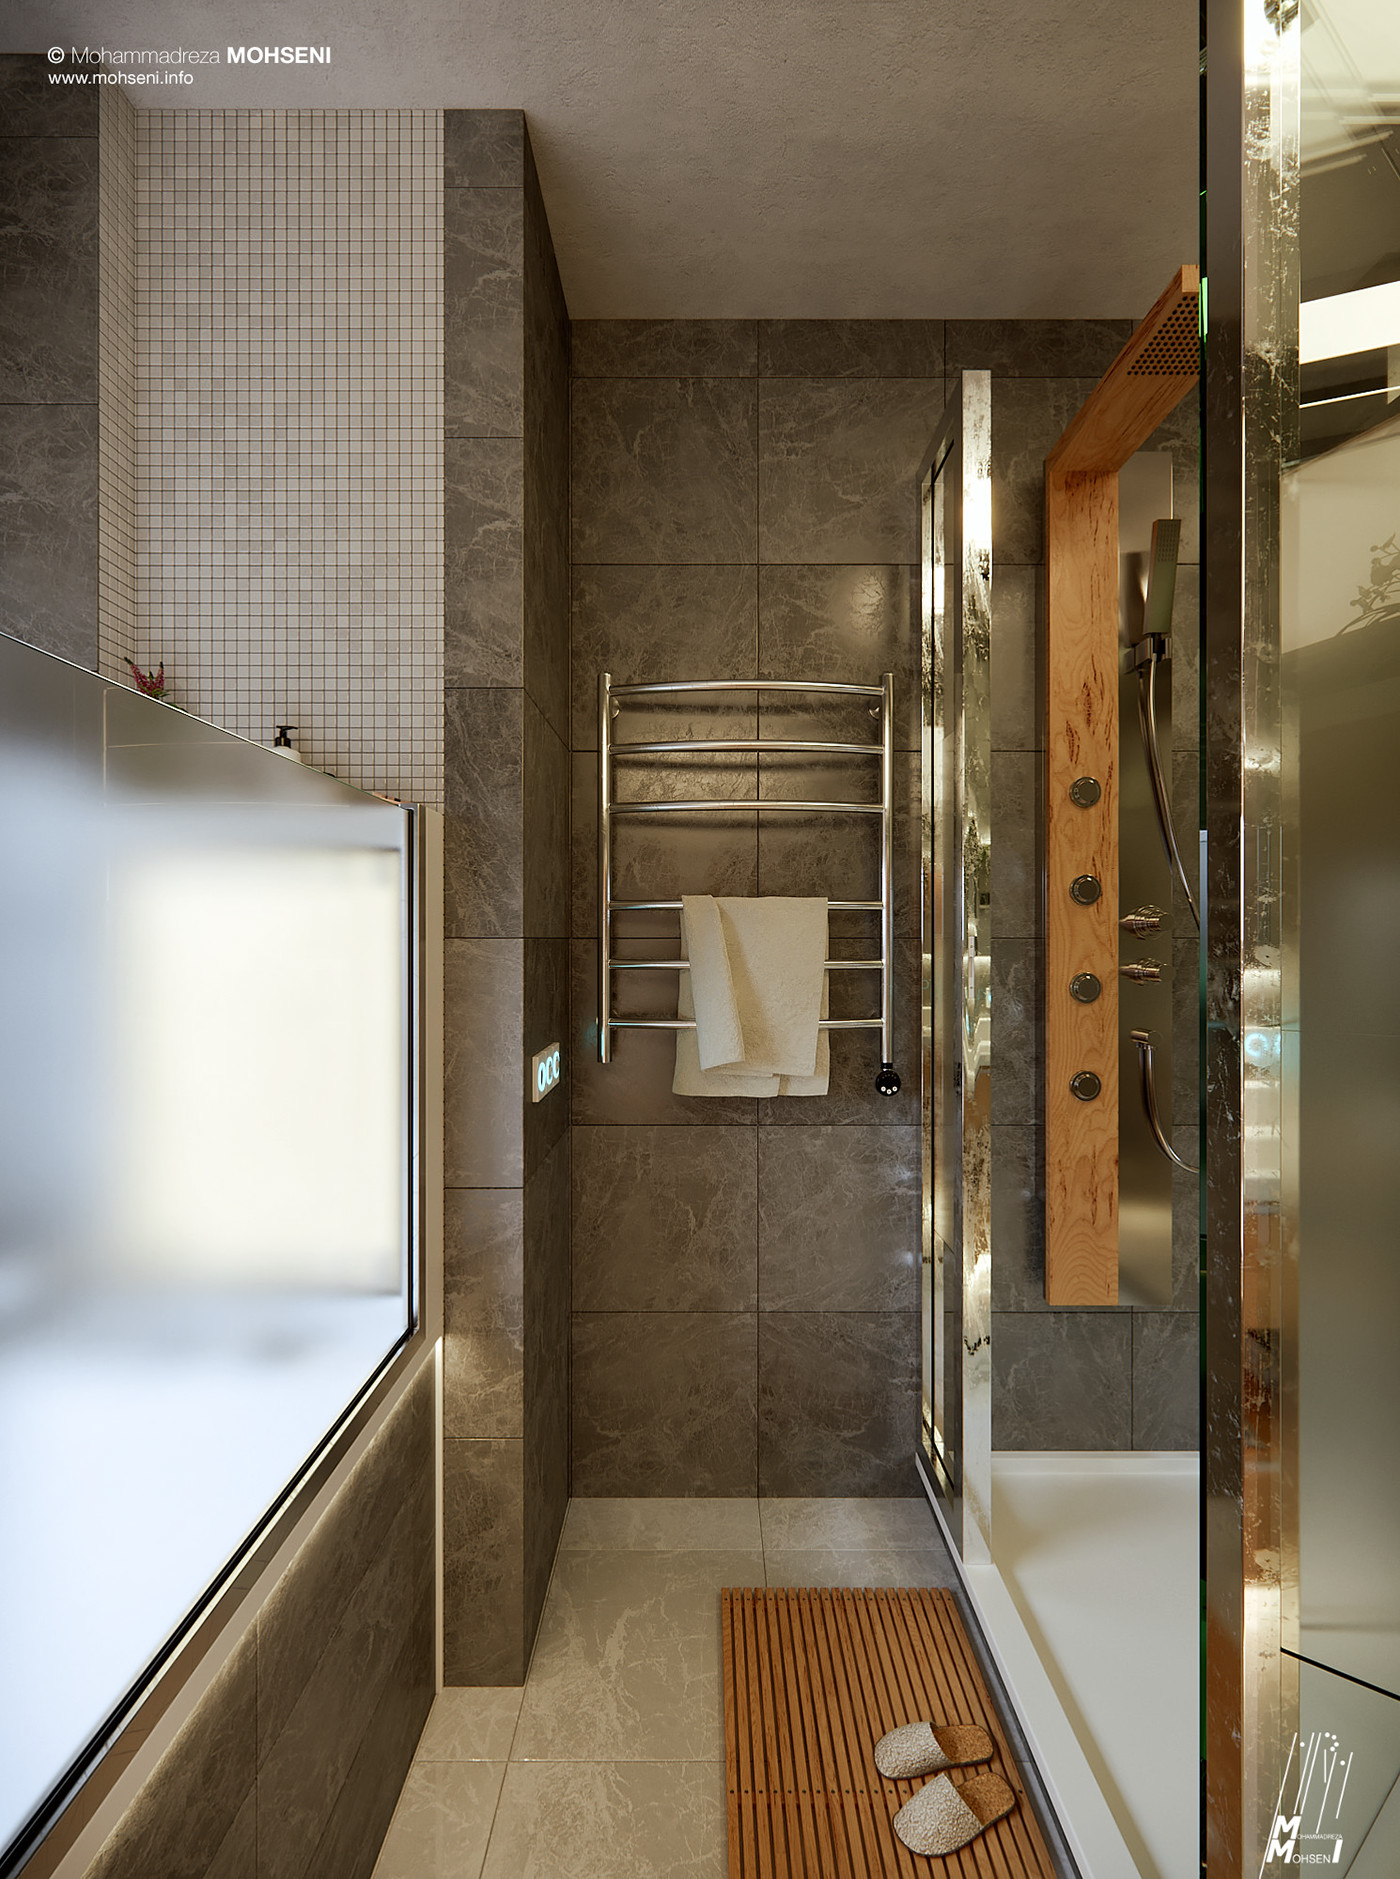 corona Interior interiordesign randomcontrol architecture archviz architecturalvisualization CGI 3D Render